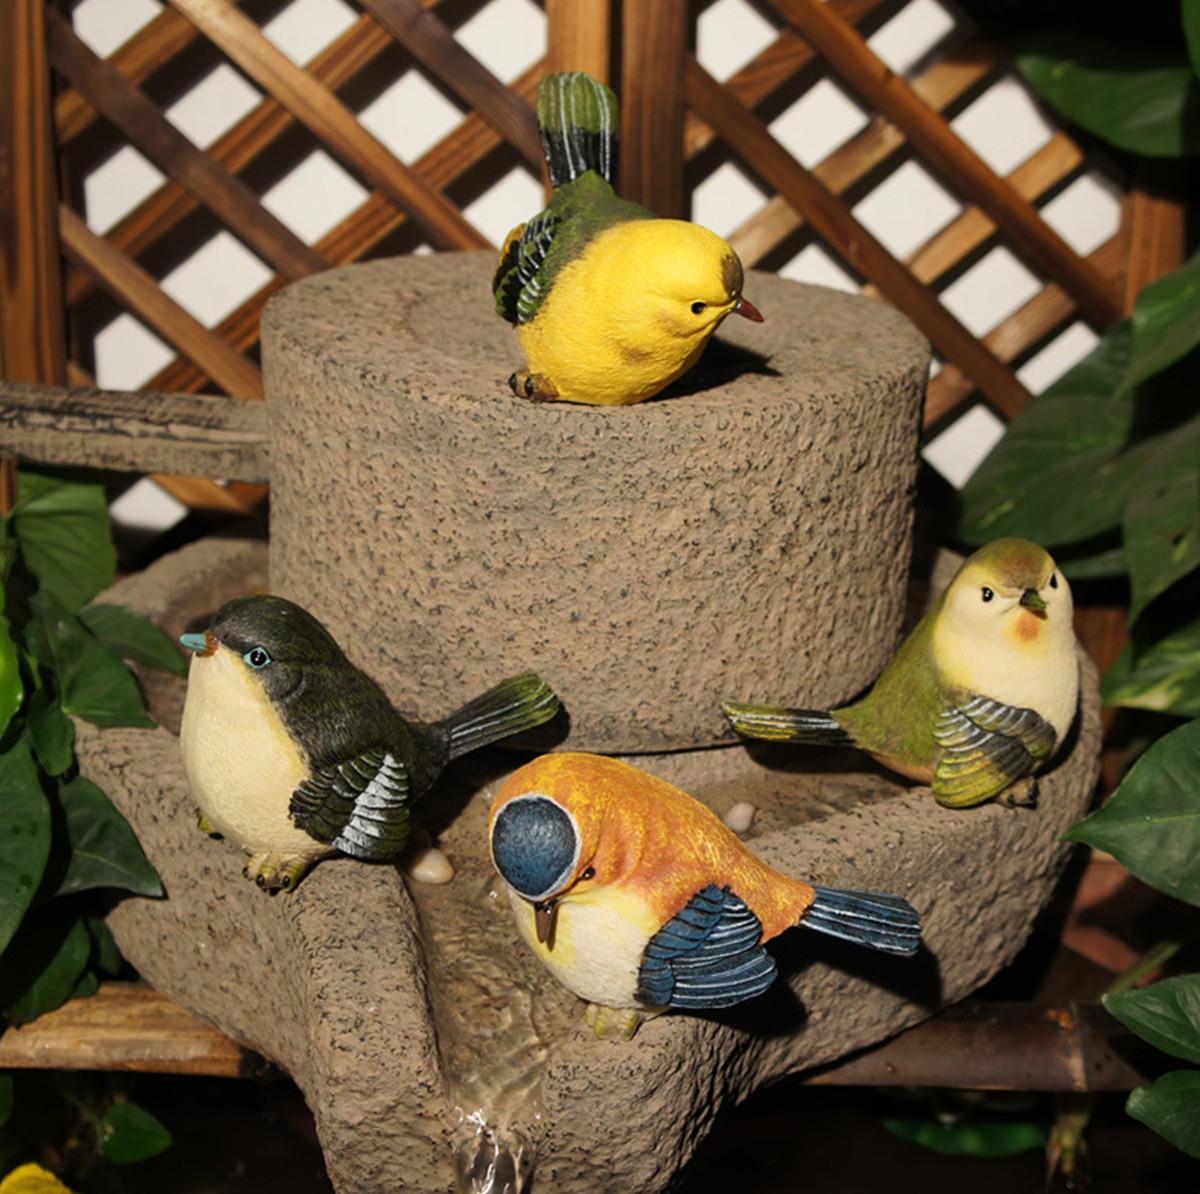 4 Pcs/Set Resin Birds Statue Figurine Home Garden DIY Bonsai Desk Decor Ornament Decorations - 10